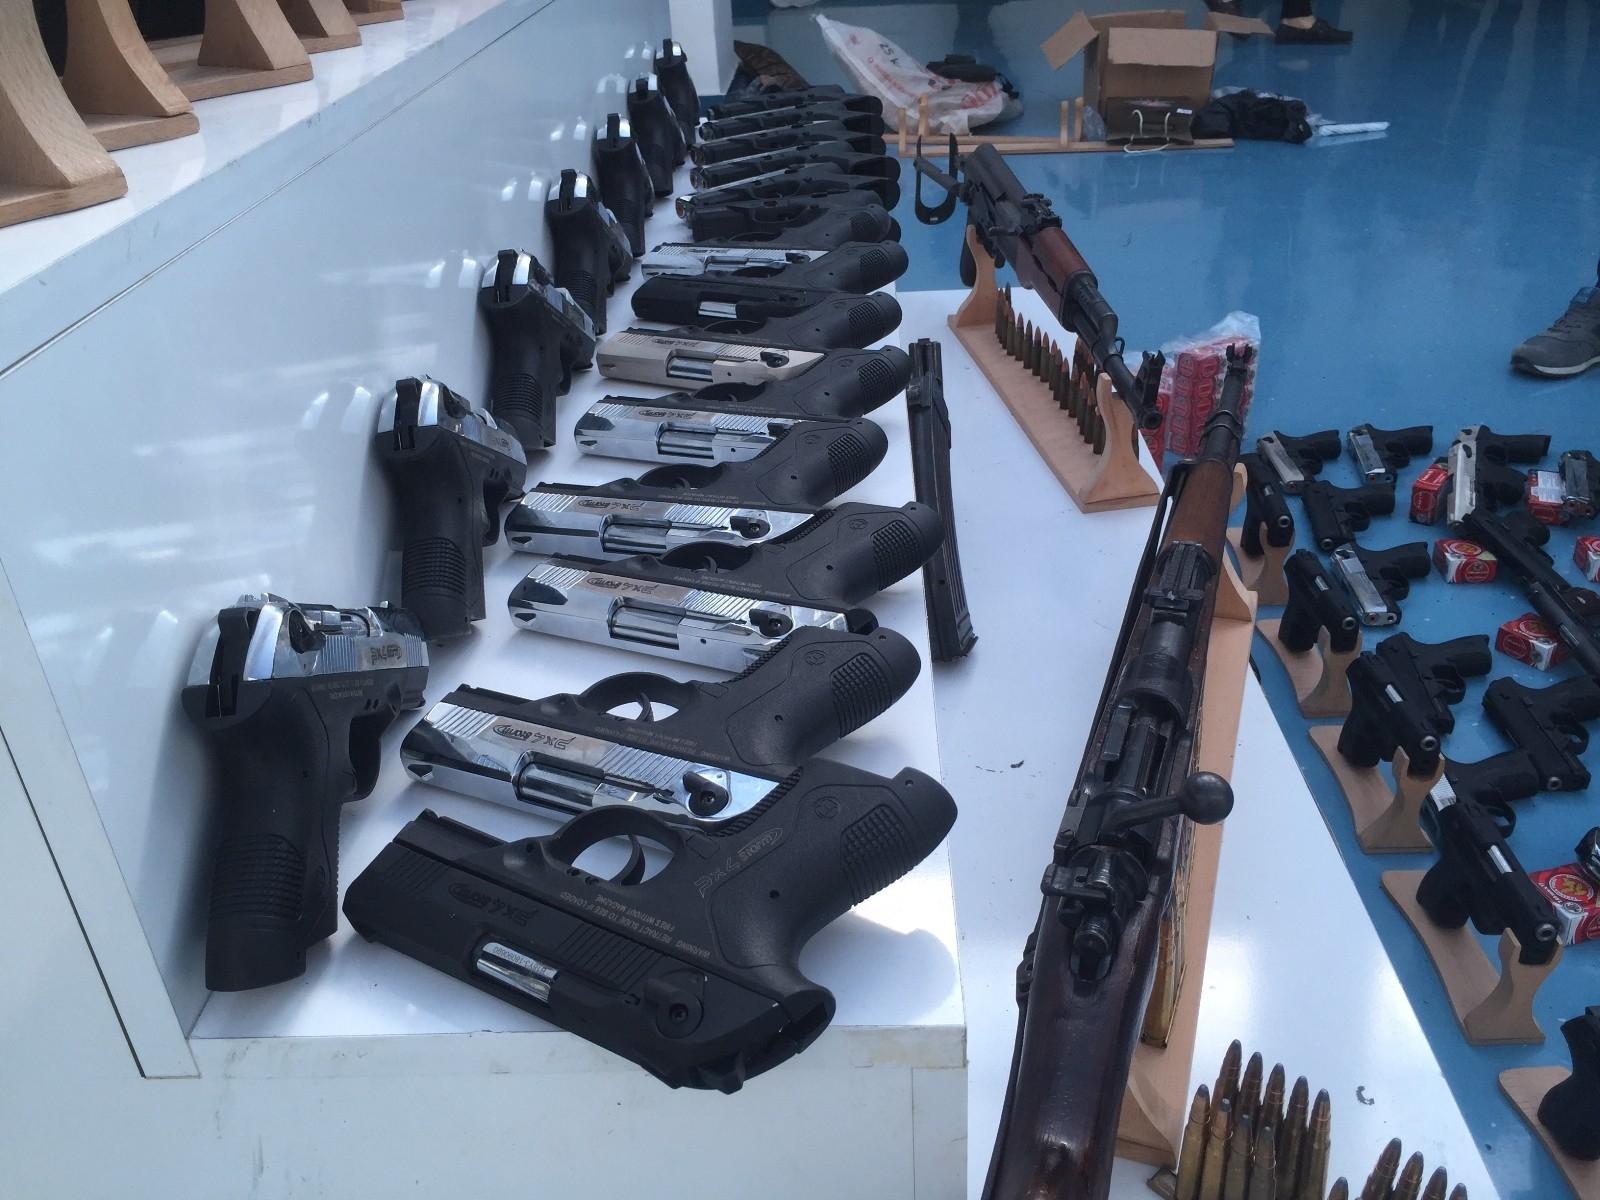 2021/04/silah-kacakciligi-operasyonu-20210427AW30-2.jpg